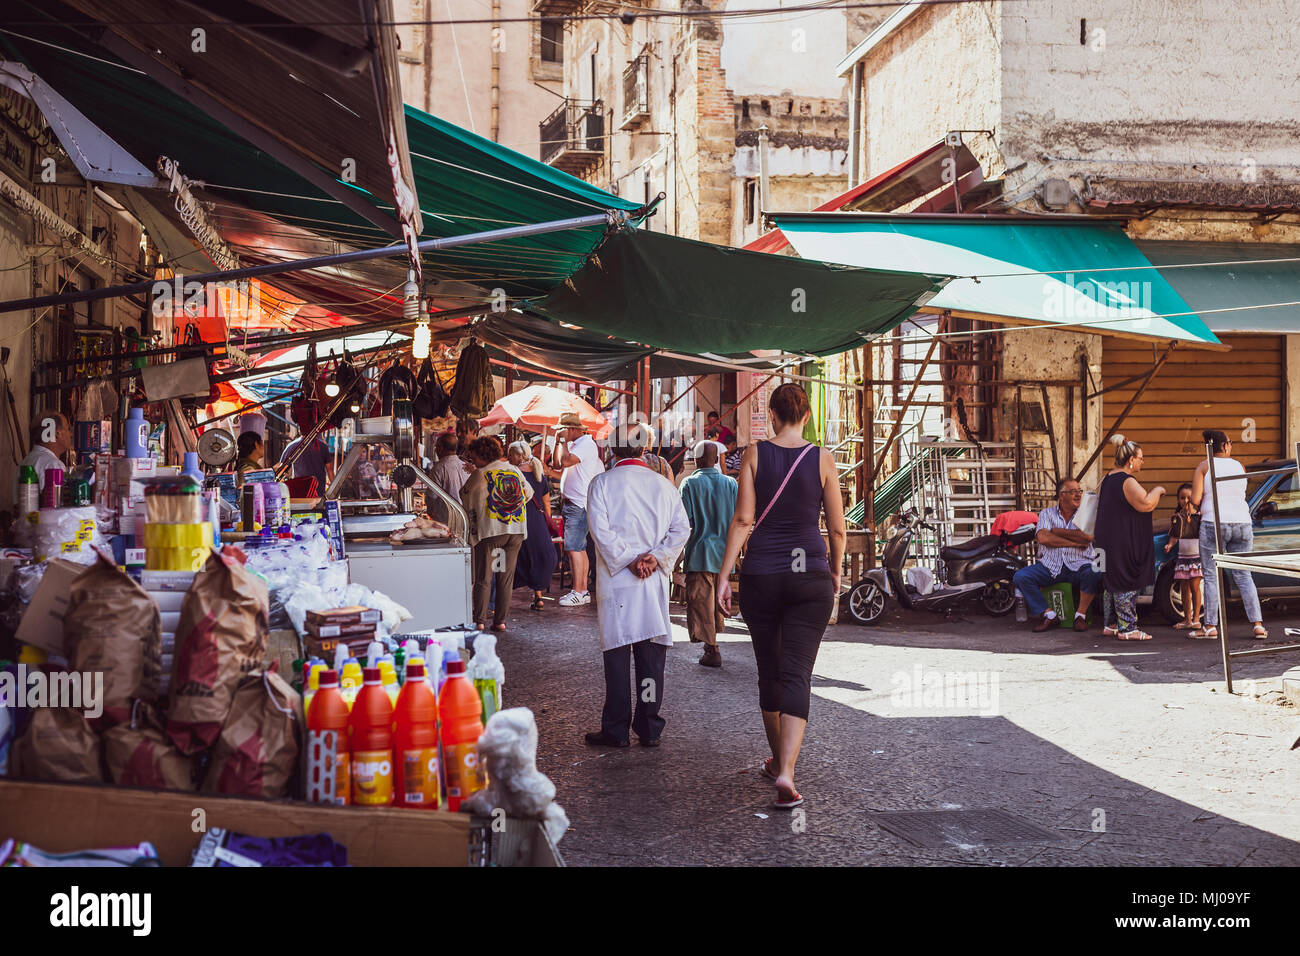 Palermo, Ballarò market, Sicily, Italy - Stock Image